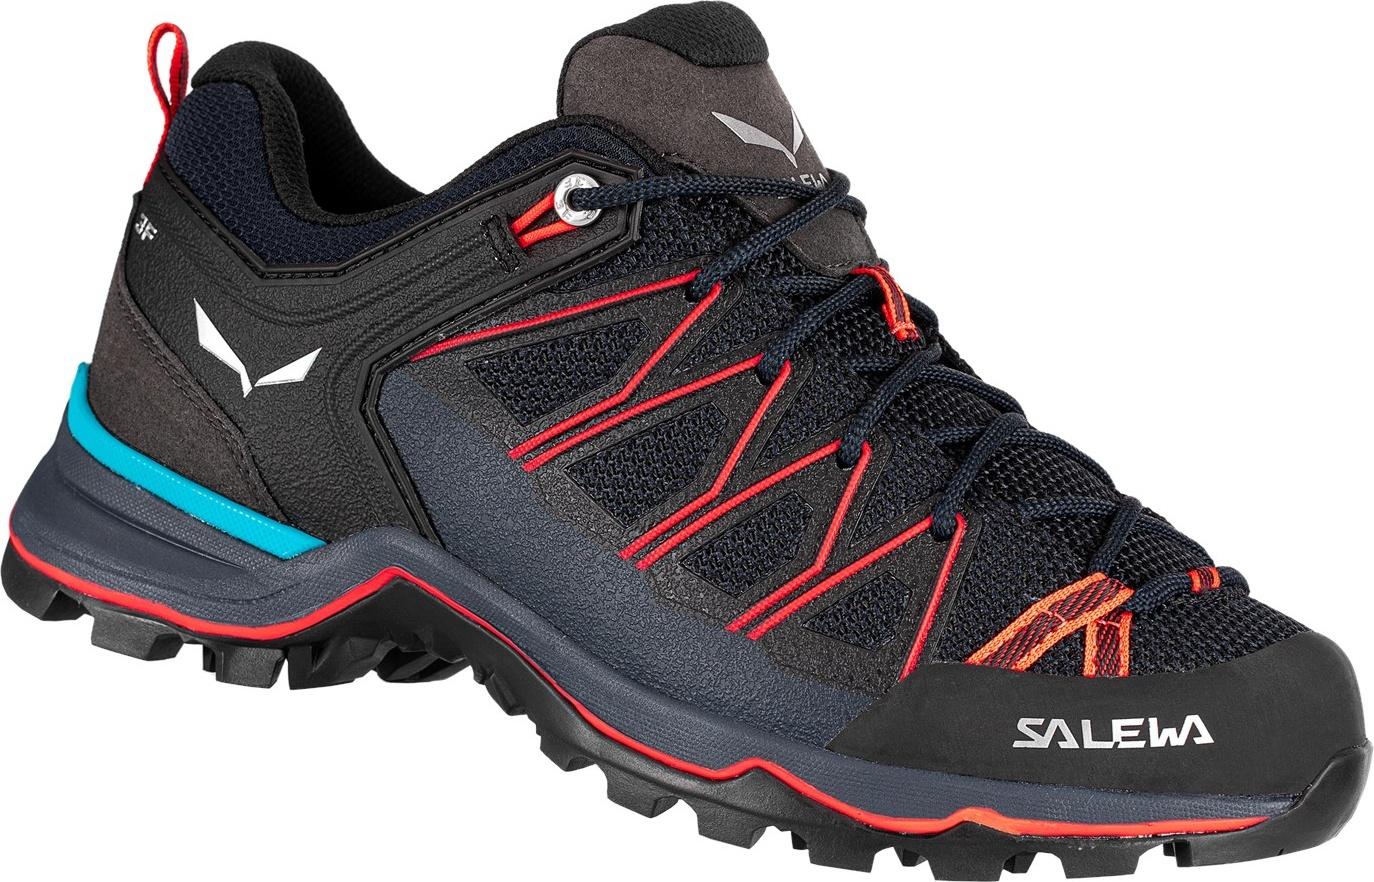 Ботинки Salewa Mtn Trainer Lite Women's, розовые/серые, 5.5 UK